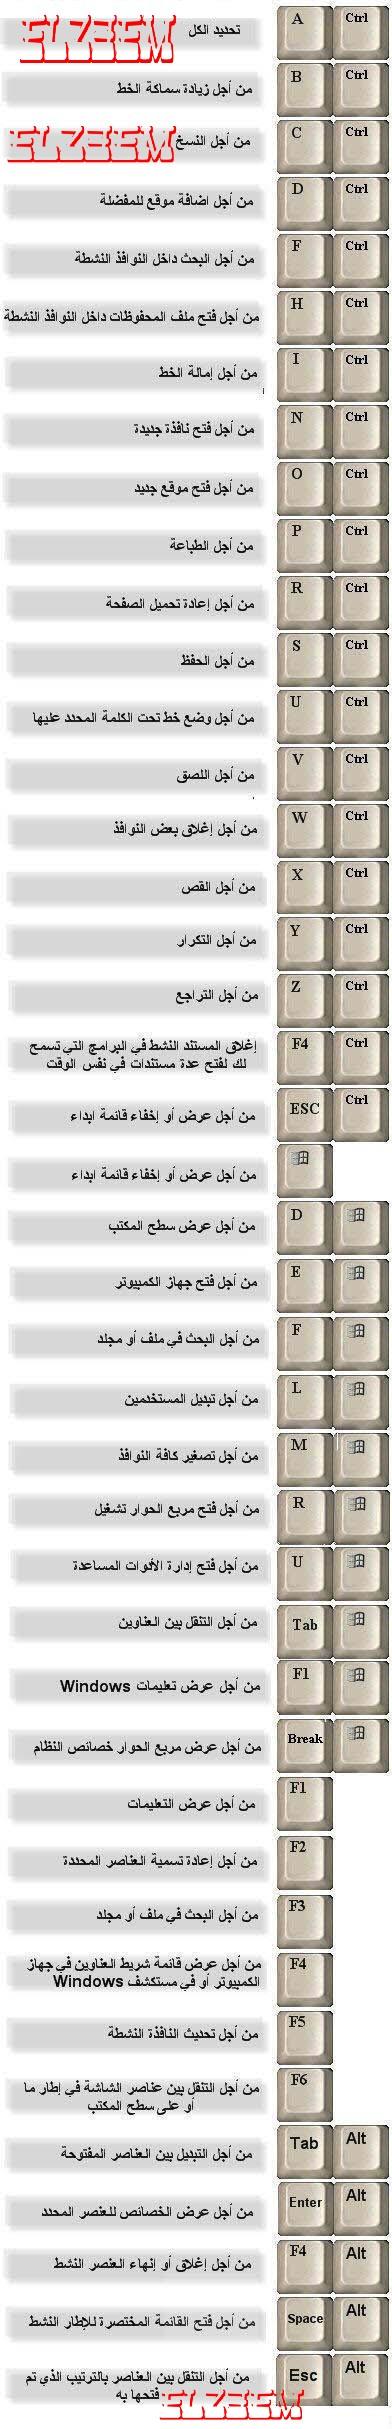 إختصارات المفاتيح c666aa10.jpg